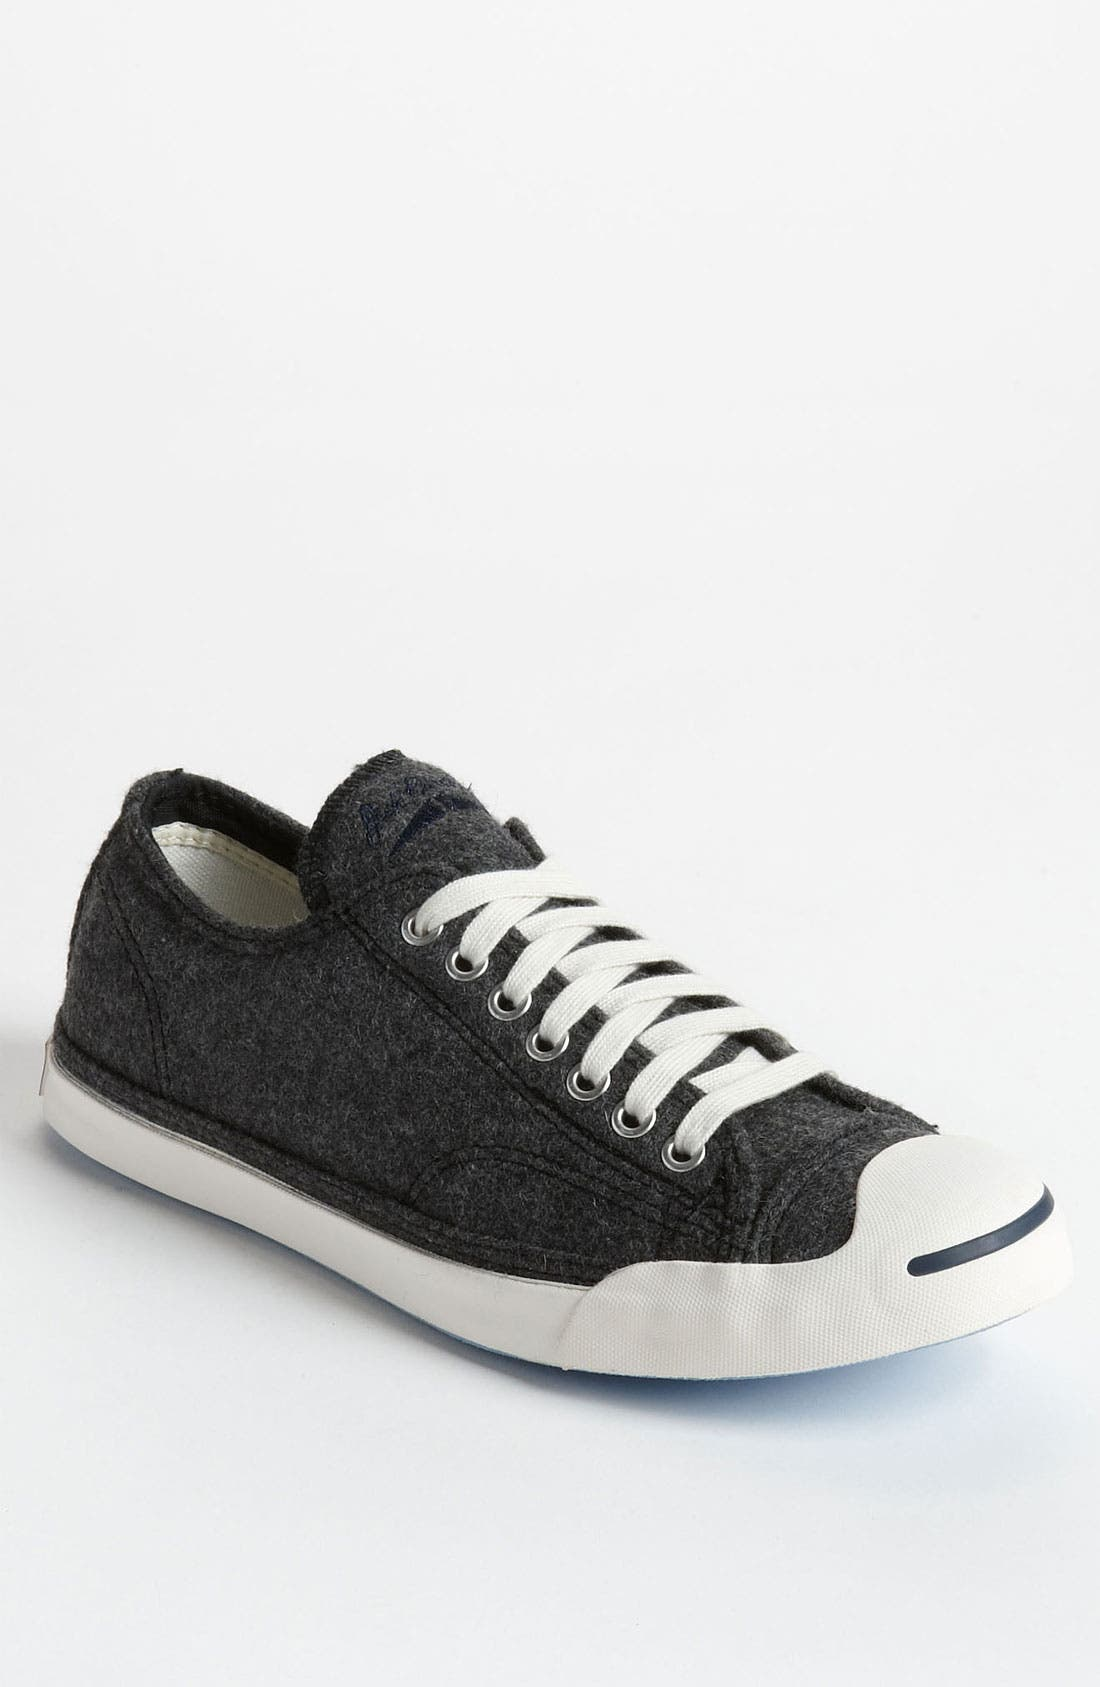 Alternate Image 1 Selected - Converse 'Jack Purcell LP' Slip-On Sneaker (Men)